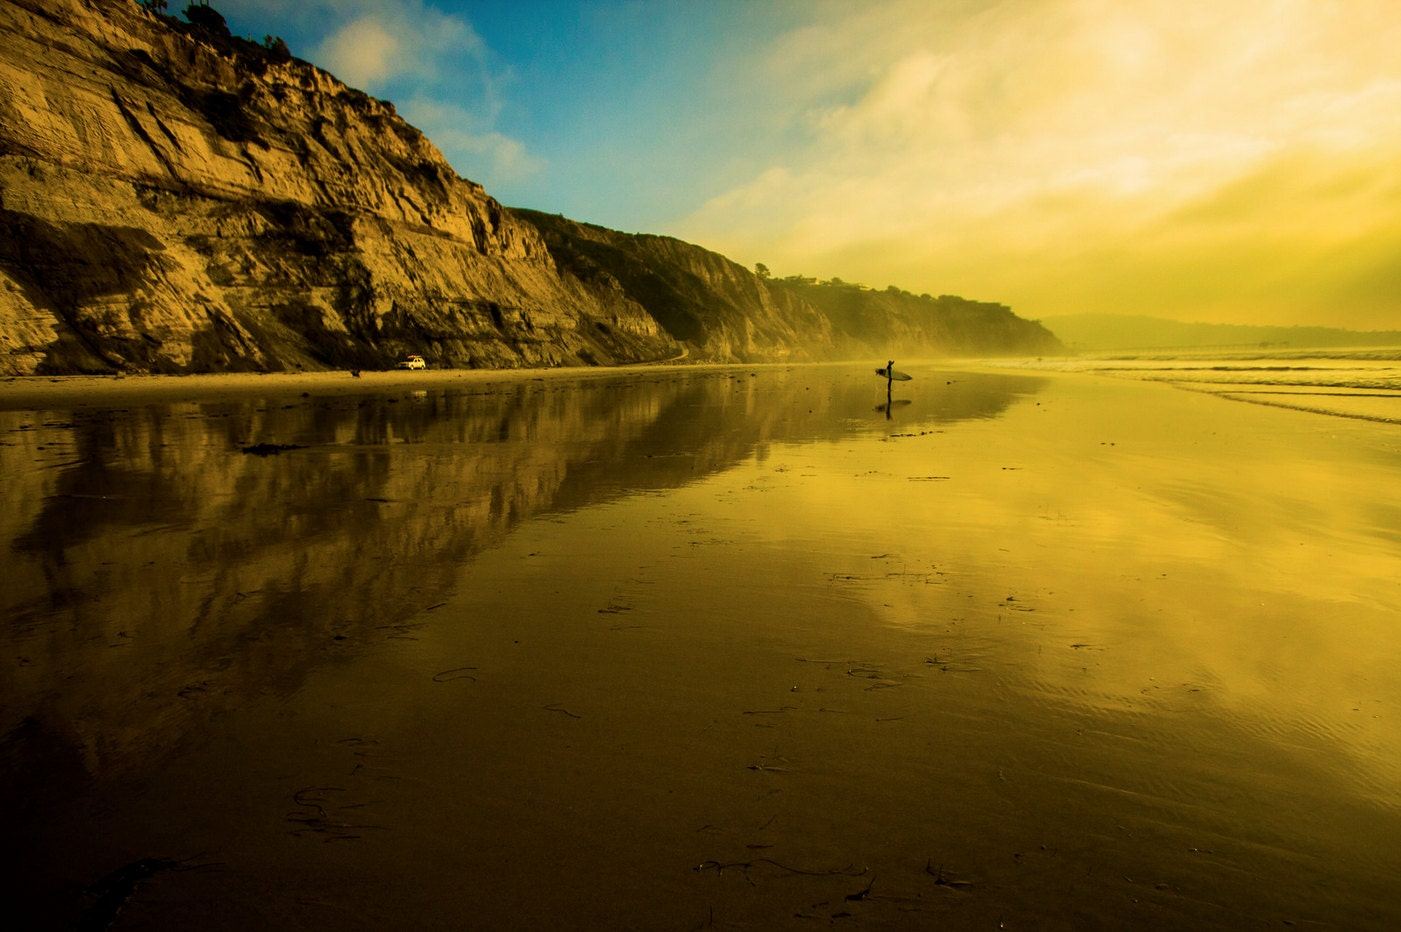 Sunset at Black\'s Beach 12x18 16x24 20x30 24x36 Metal